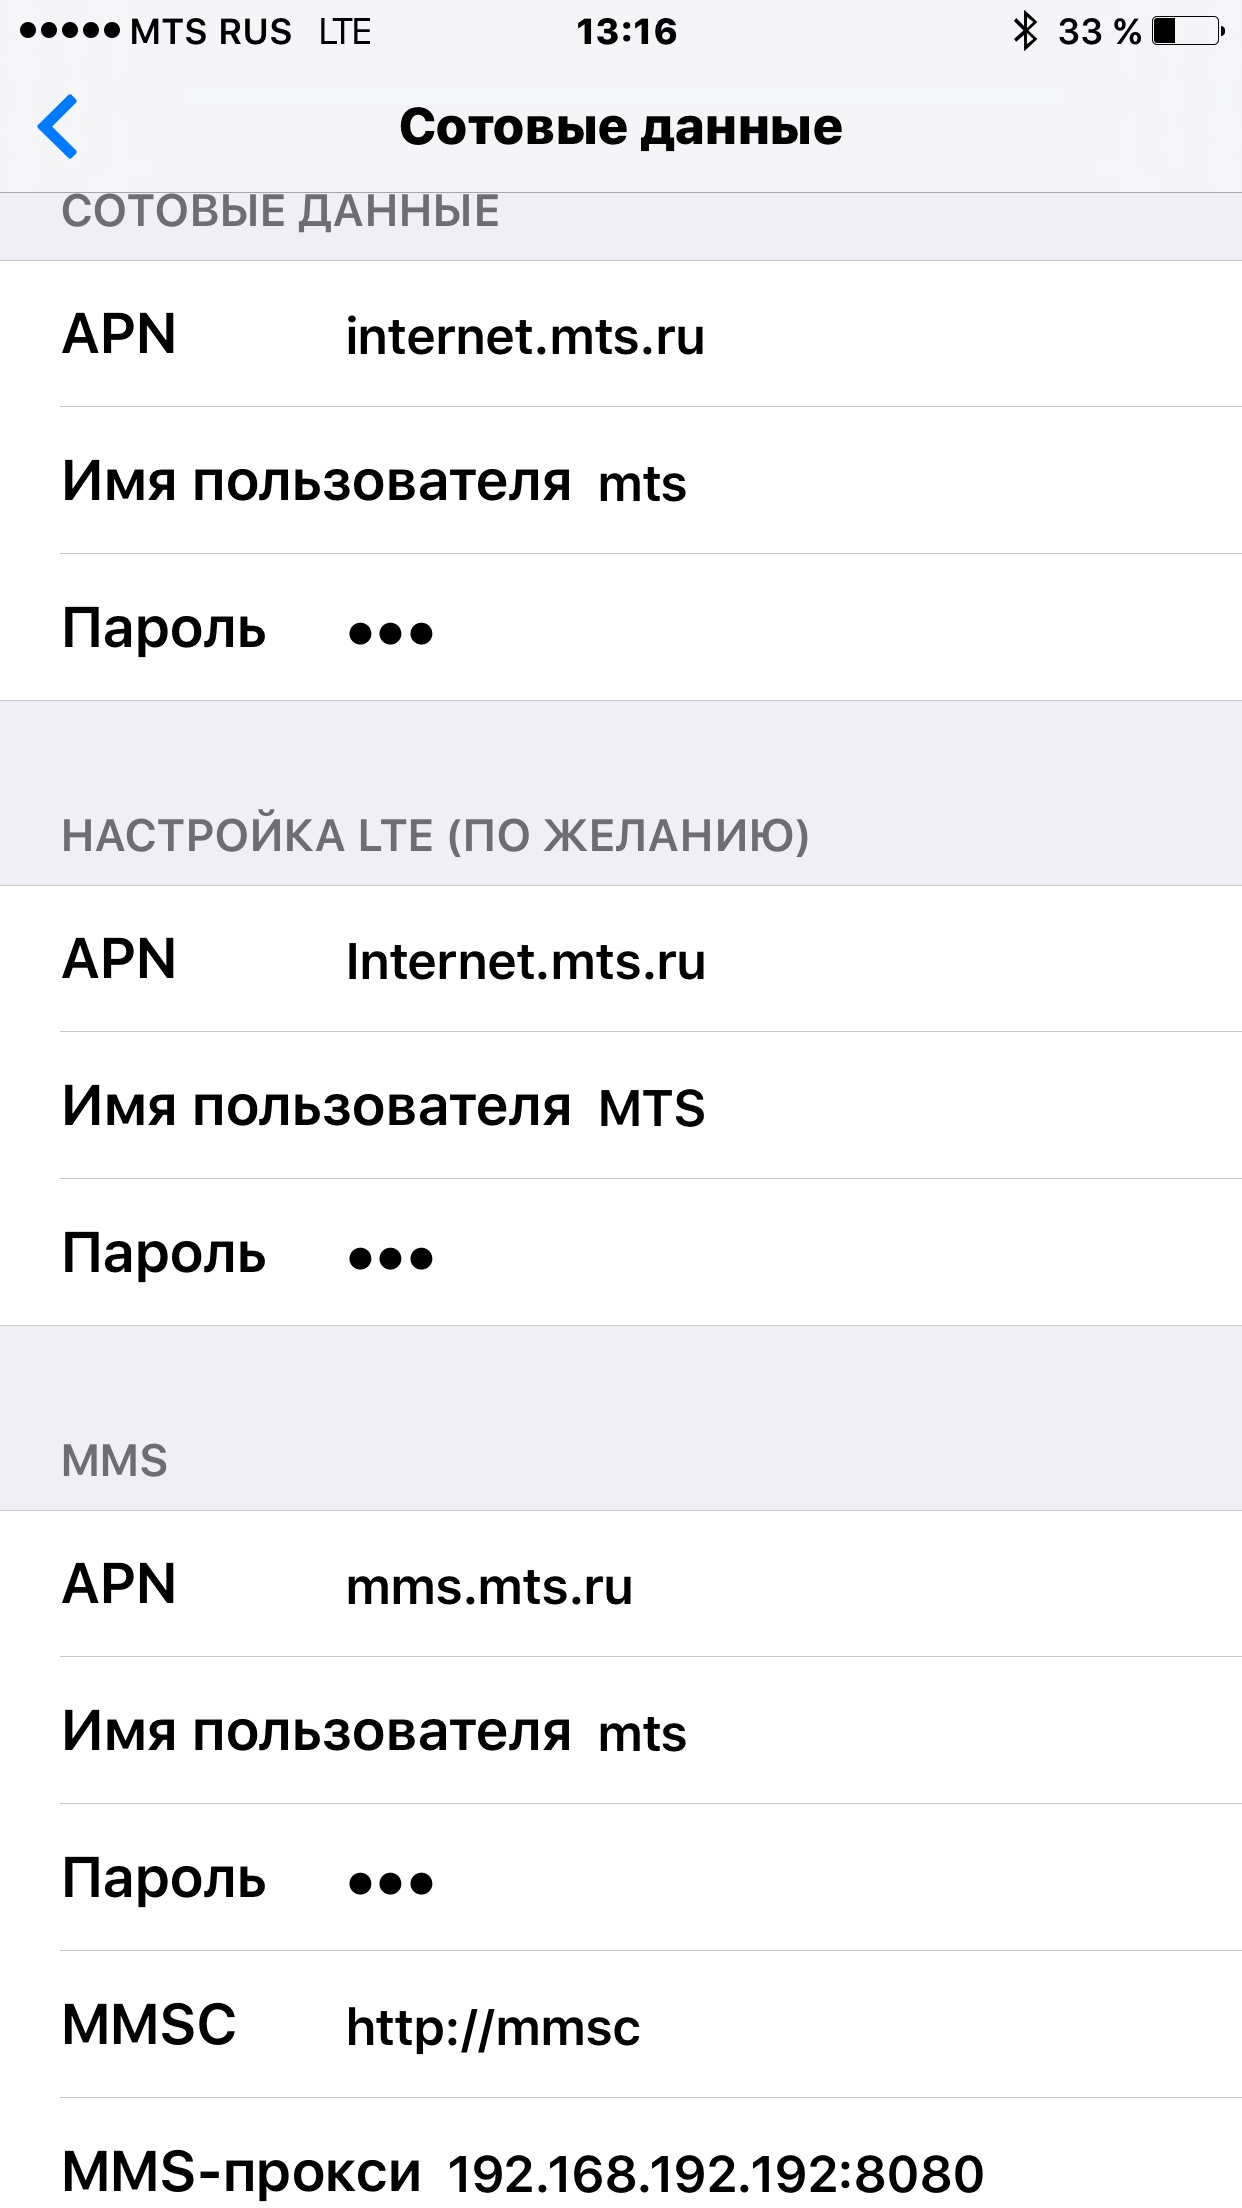 7bea010e30509 APN: internet.mts.ru. Имя пользователя: mts. Пароль: mts. Настройка ...